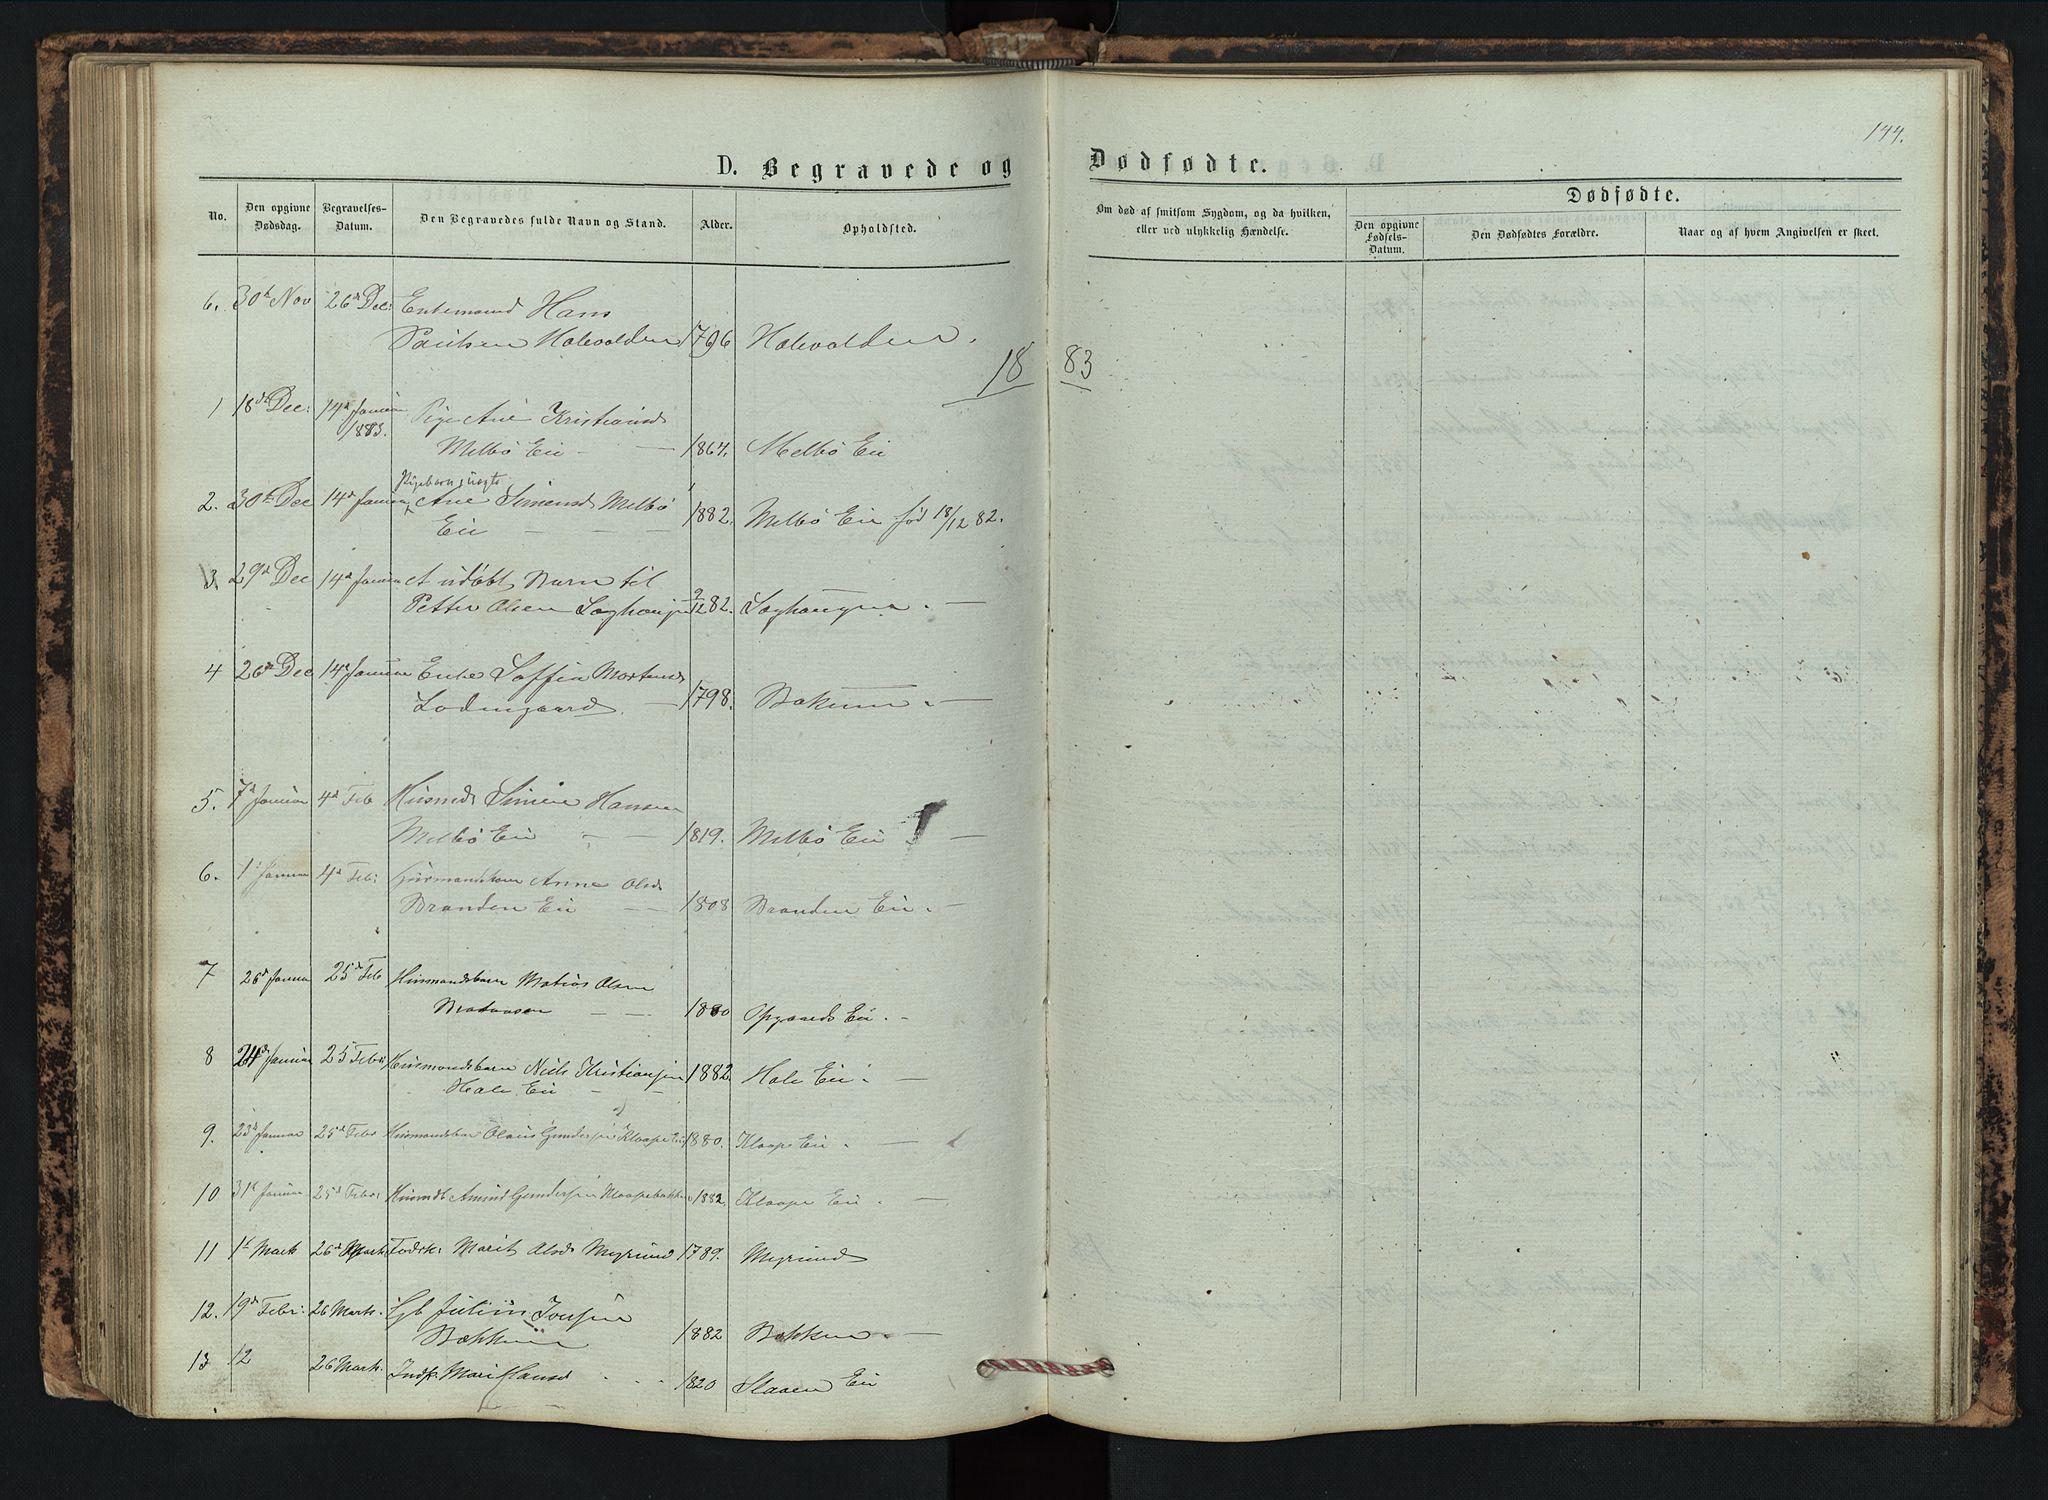 SAH, Vestre Gausdal prestekontor, Klokkerbok nr. 2, 1874-1897, s. 144